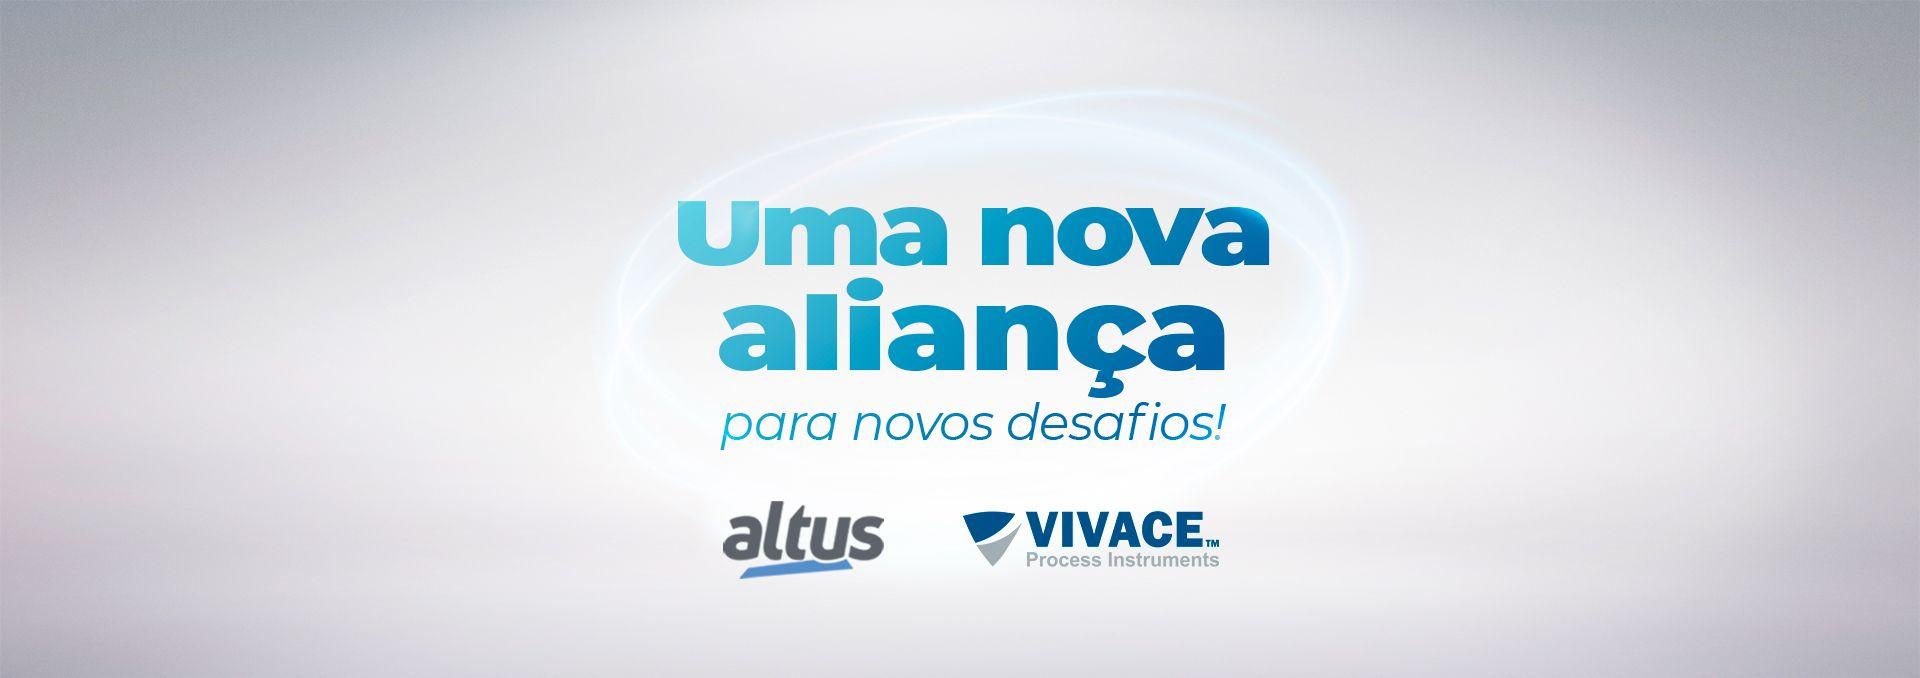 Parceria Vivace